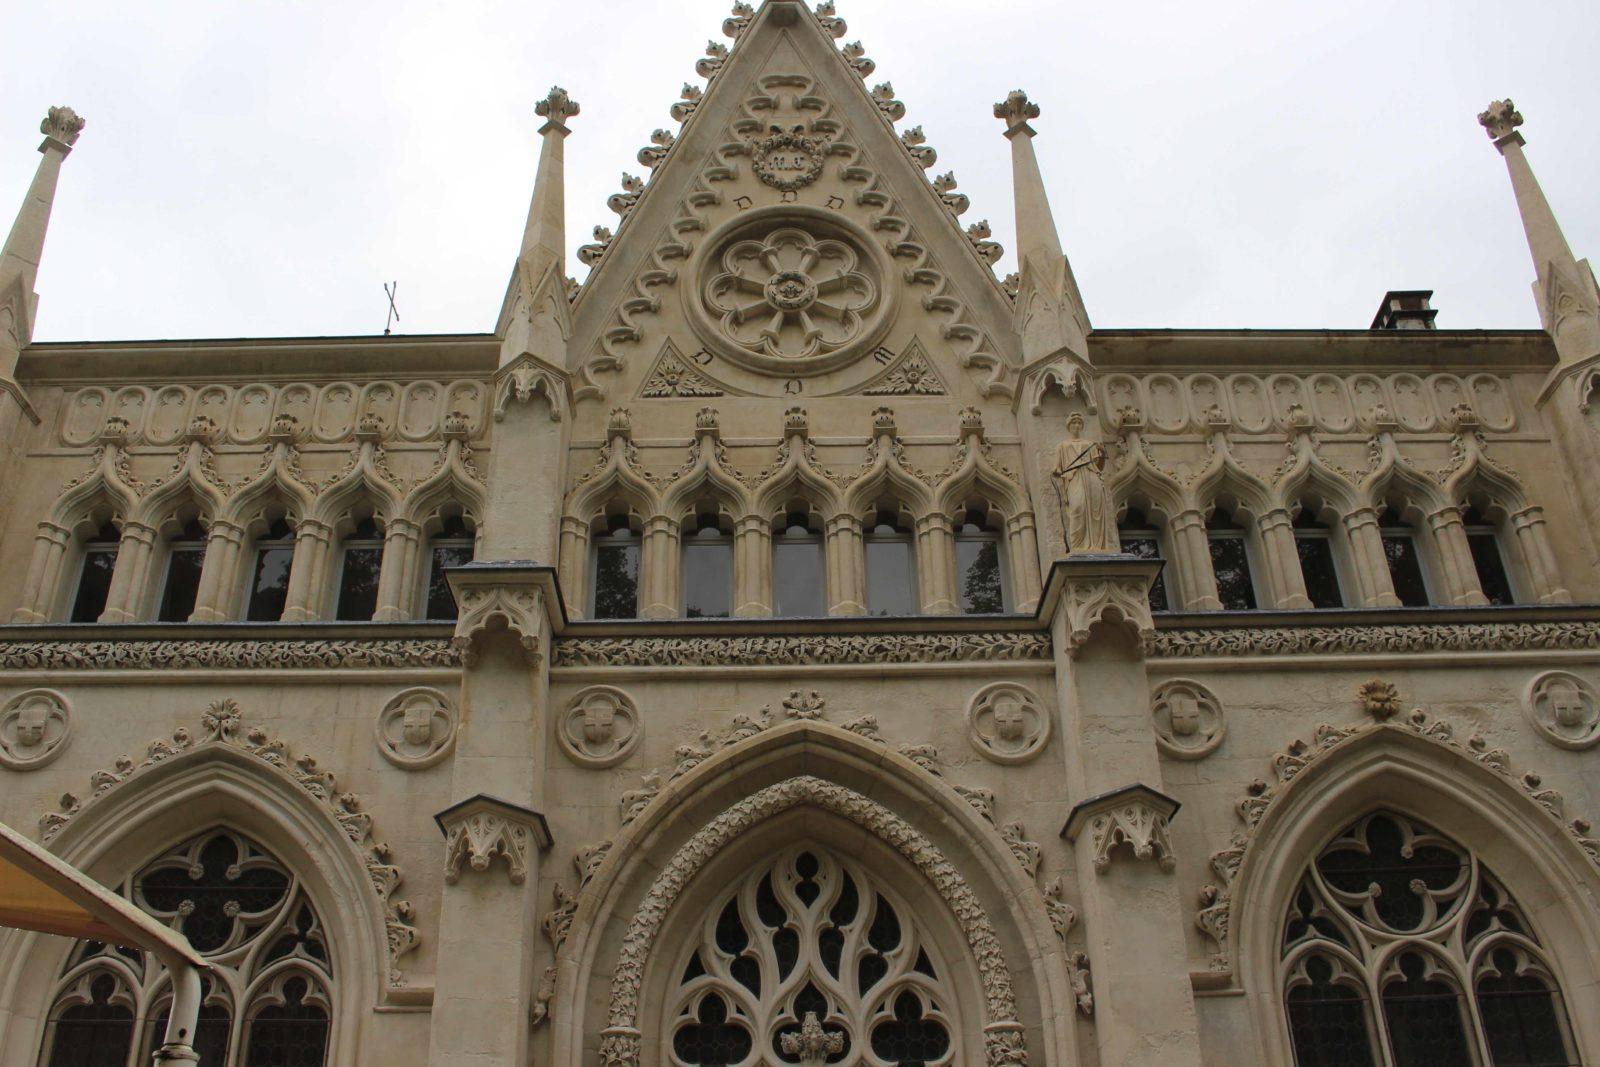 Abbaye d'Hautecombe façade